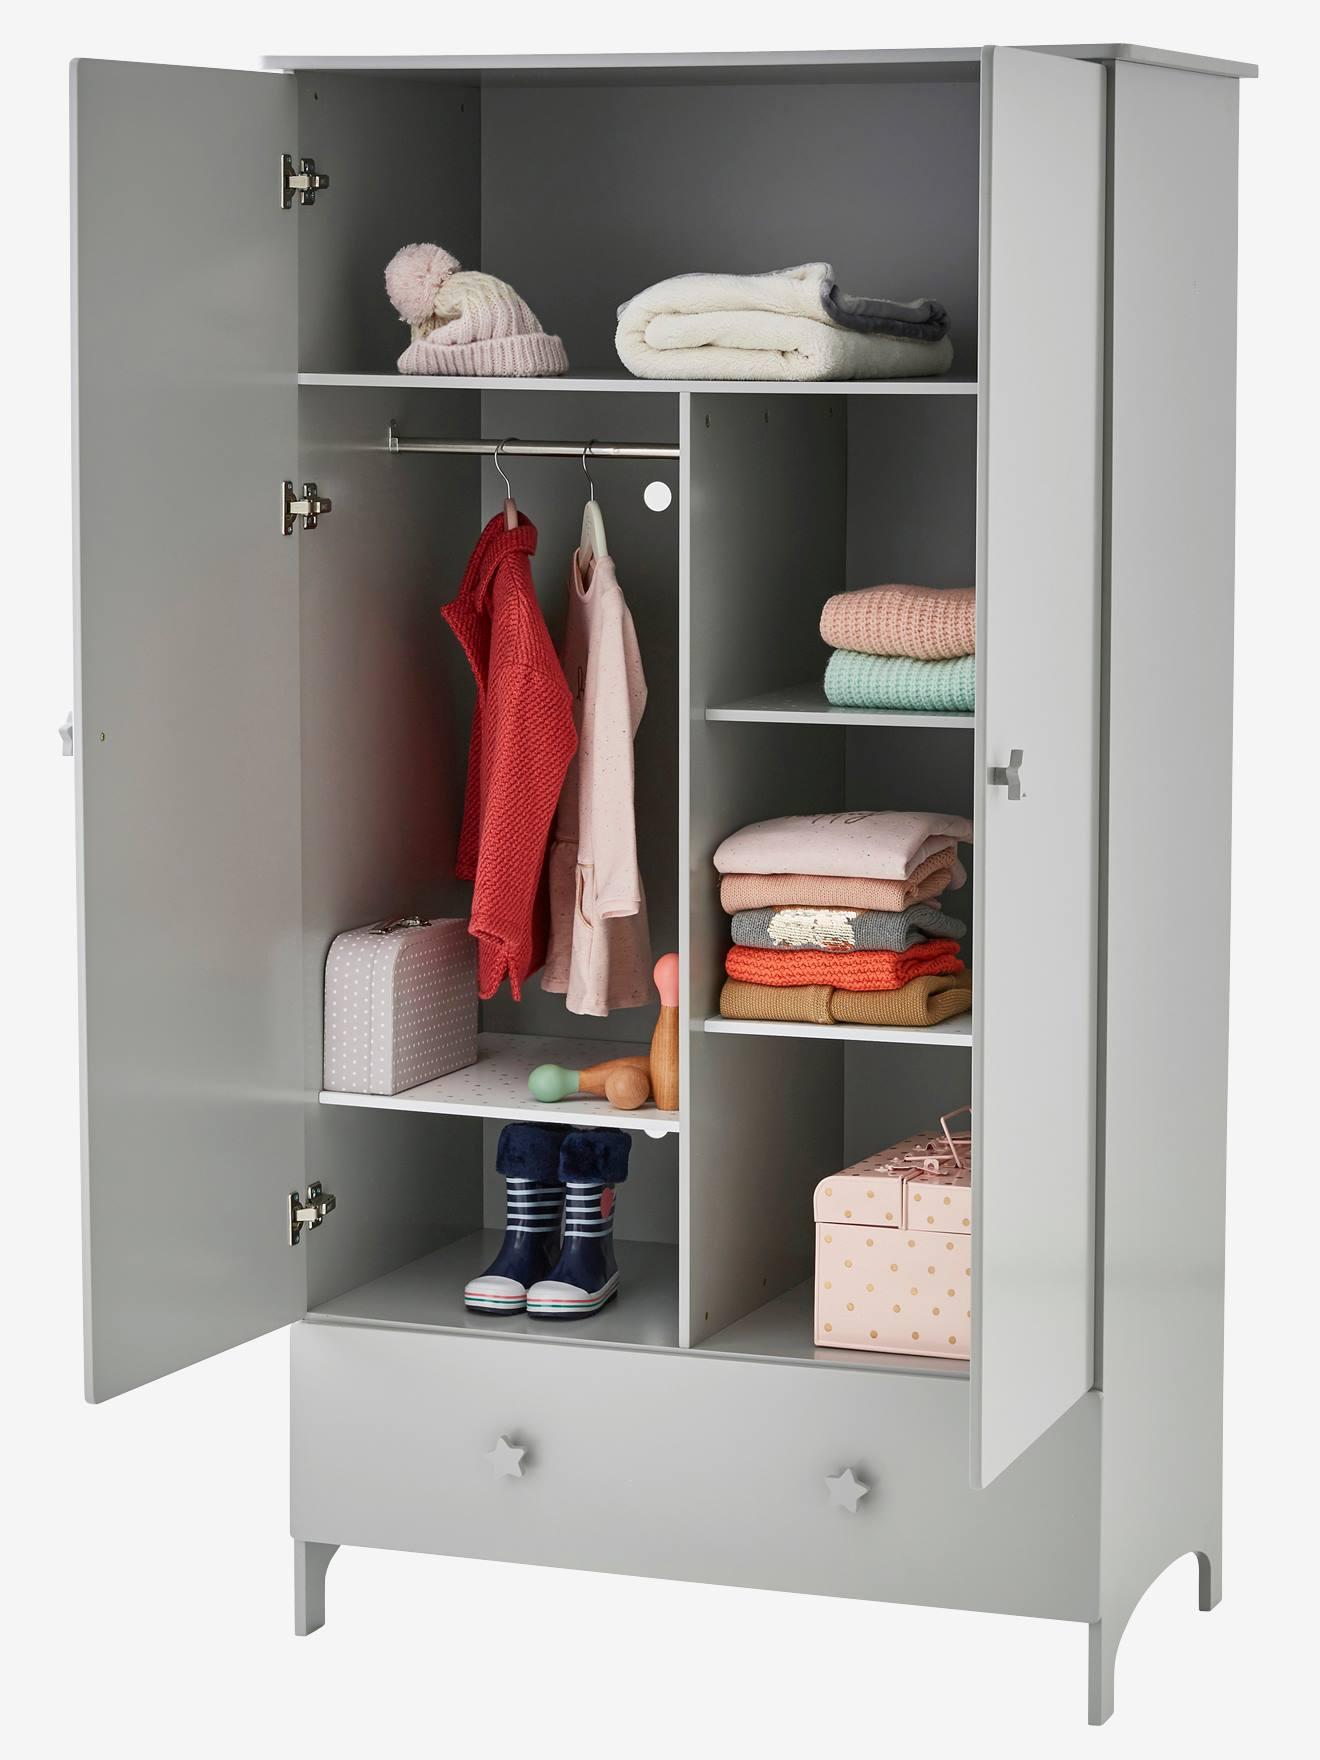 armoire verbaudet gallery of cuisine en bois vertbaudet. Black Bedroom Furniture Sets. Home Design Ideas